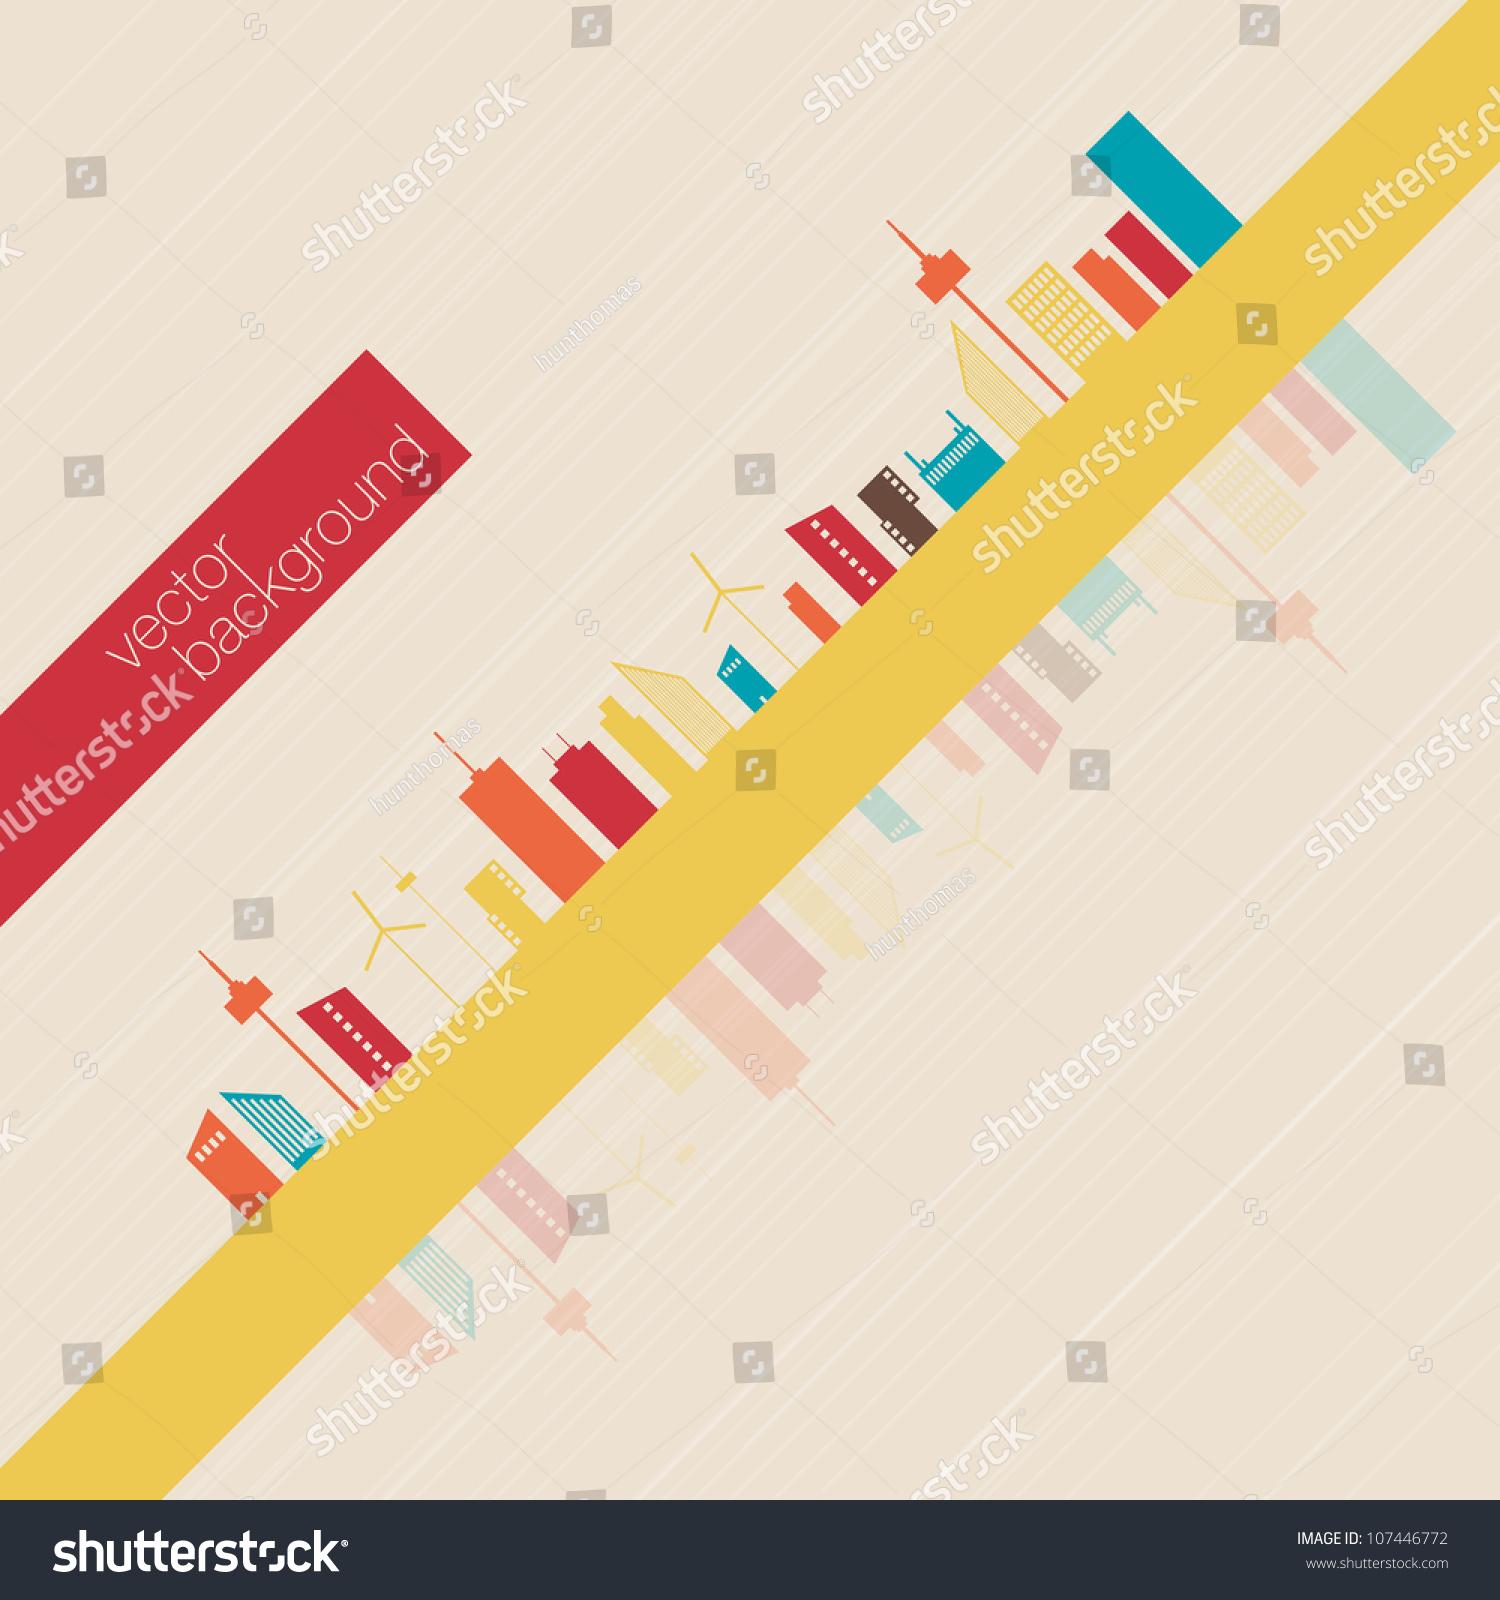 Colorful Minimalist Design: Minimalist Colorful Panorama City Background